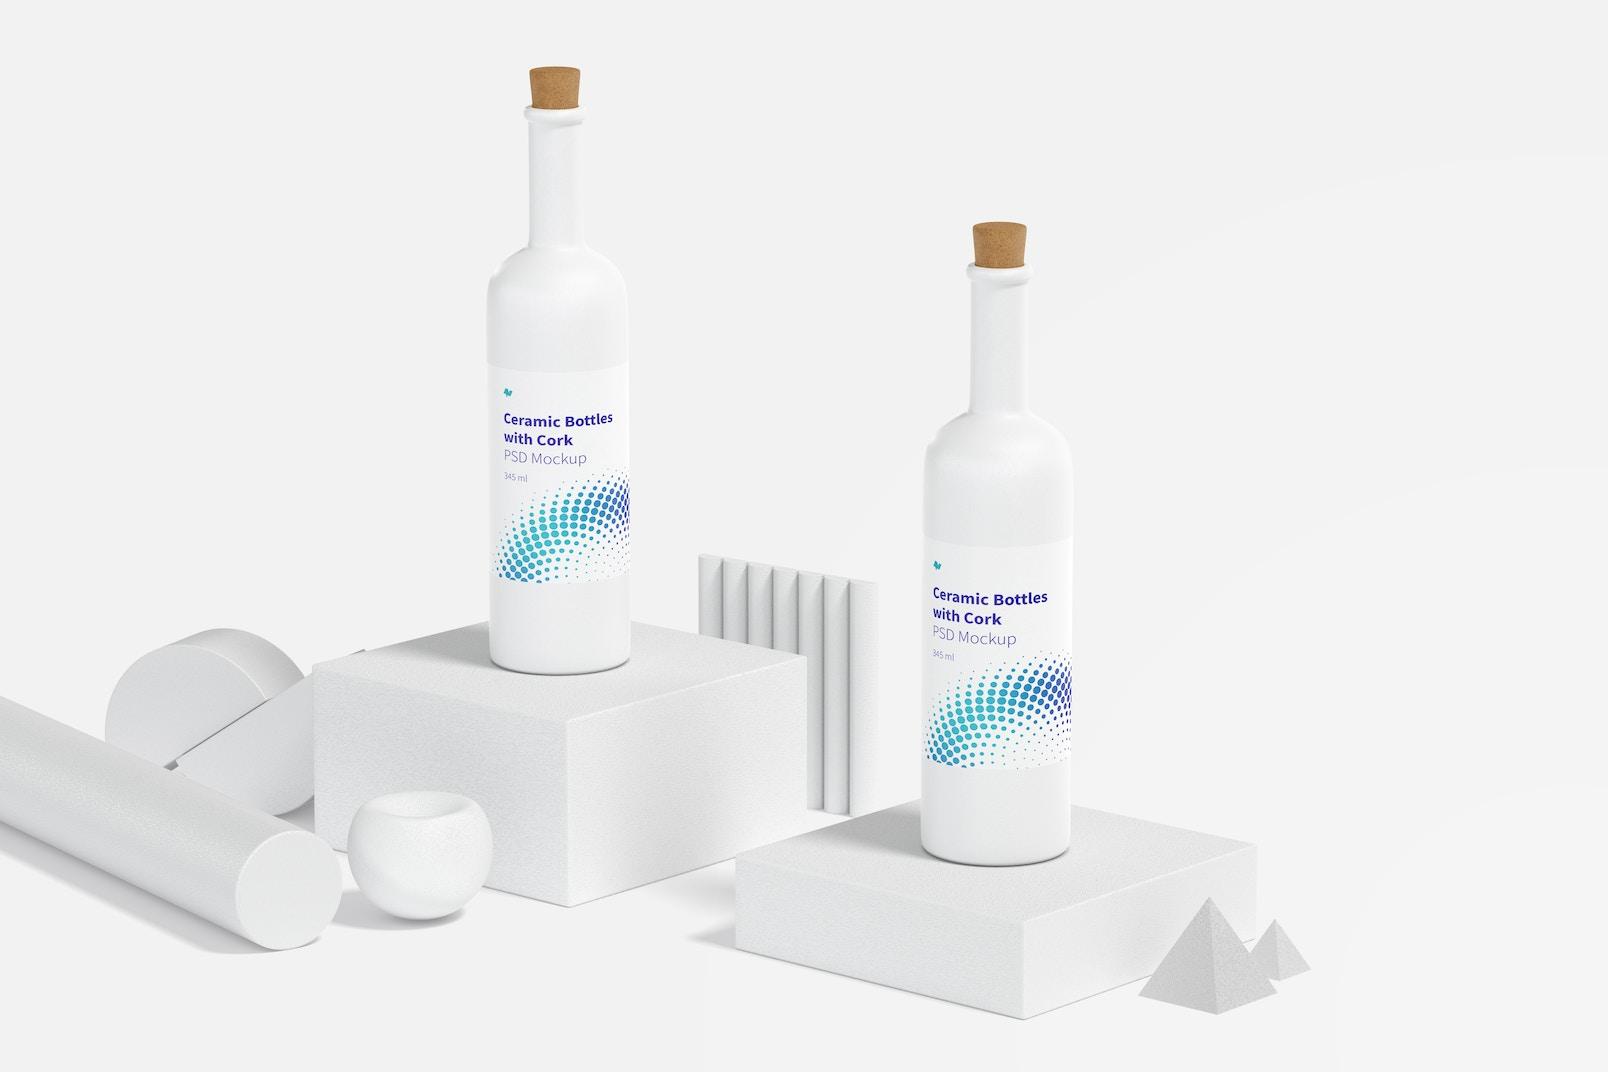 Long Neck Ceramic Bottles with Cork Mockup, Perspective